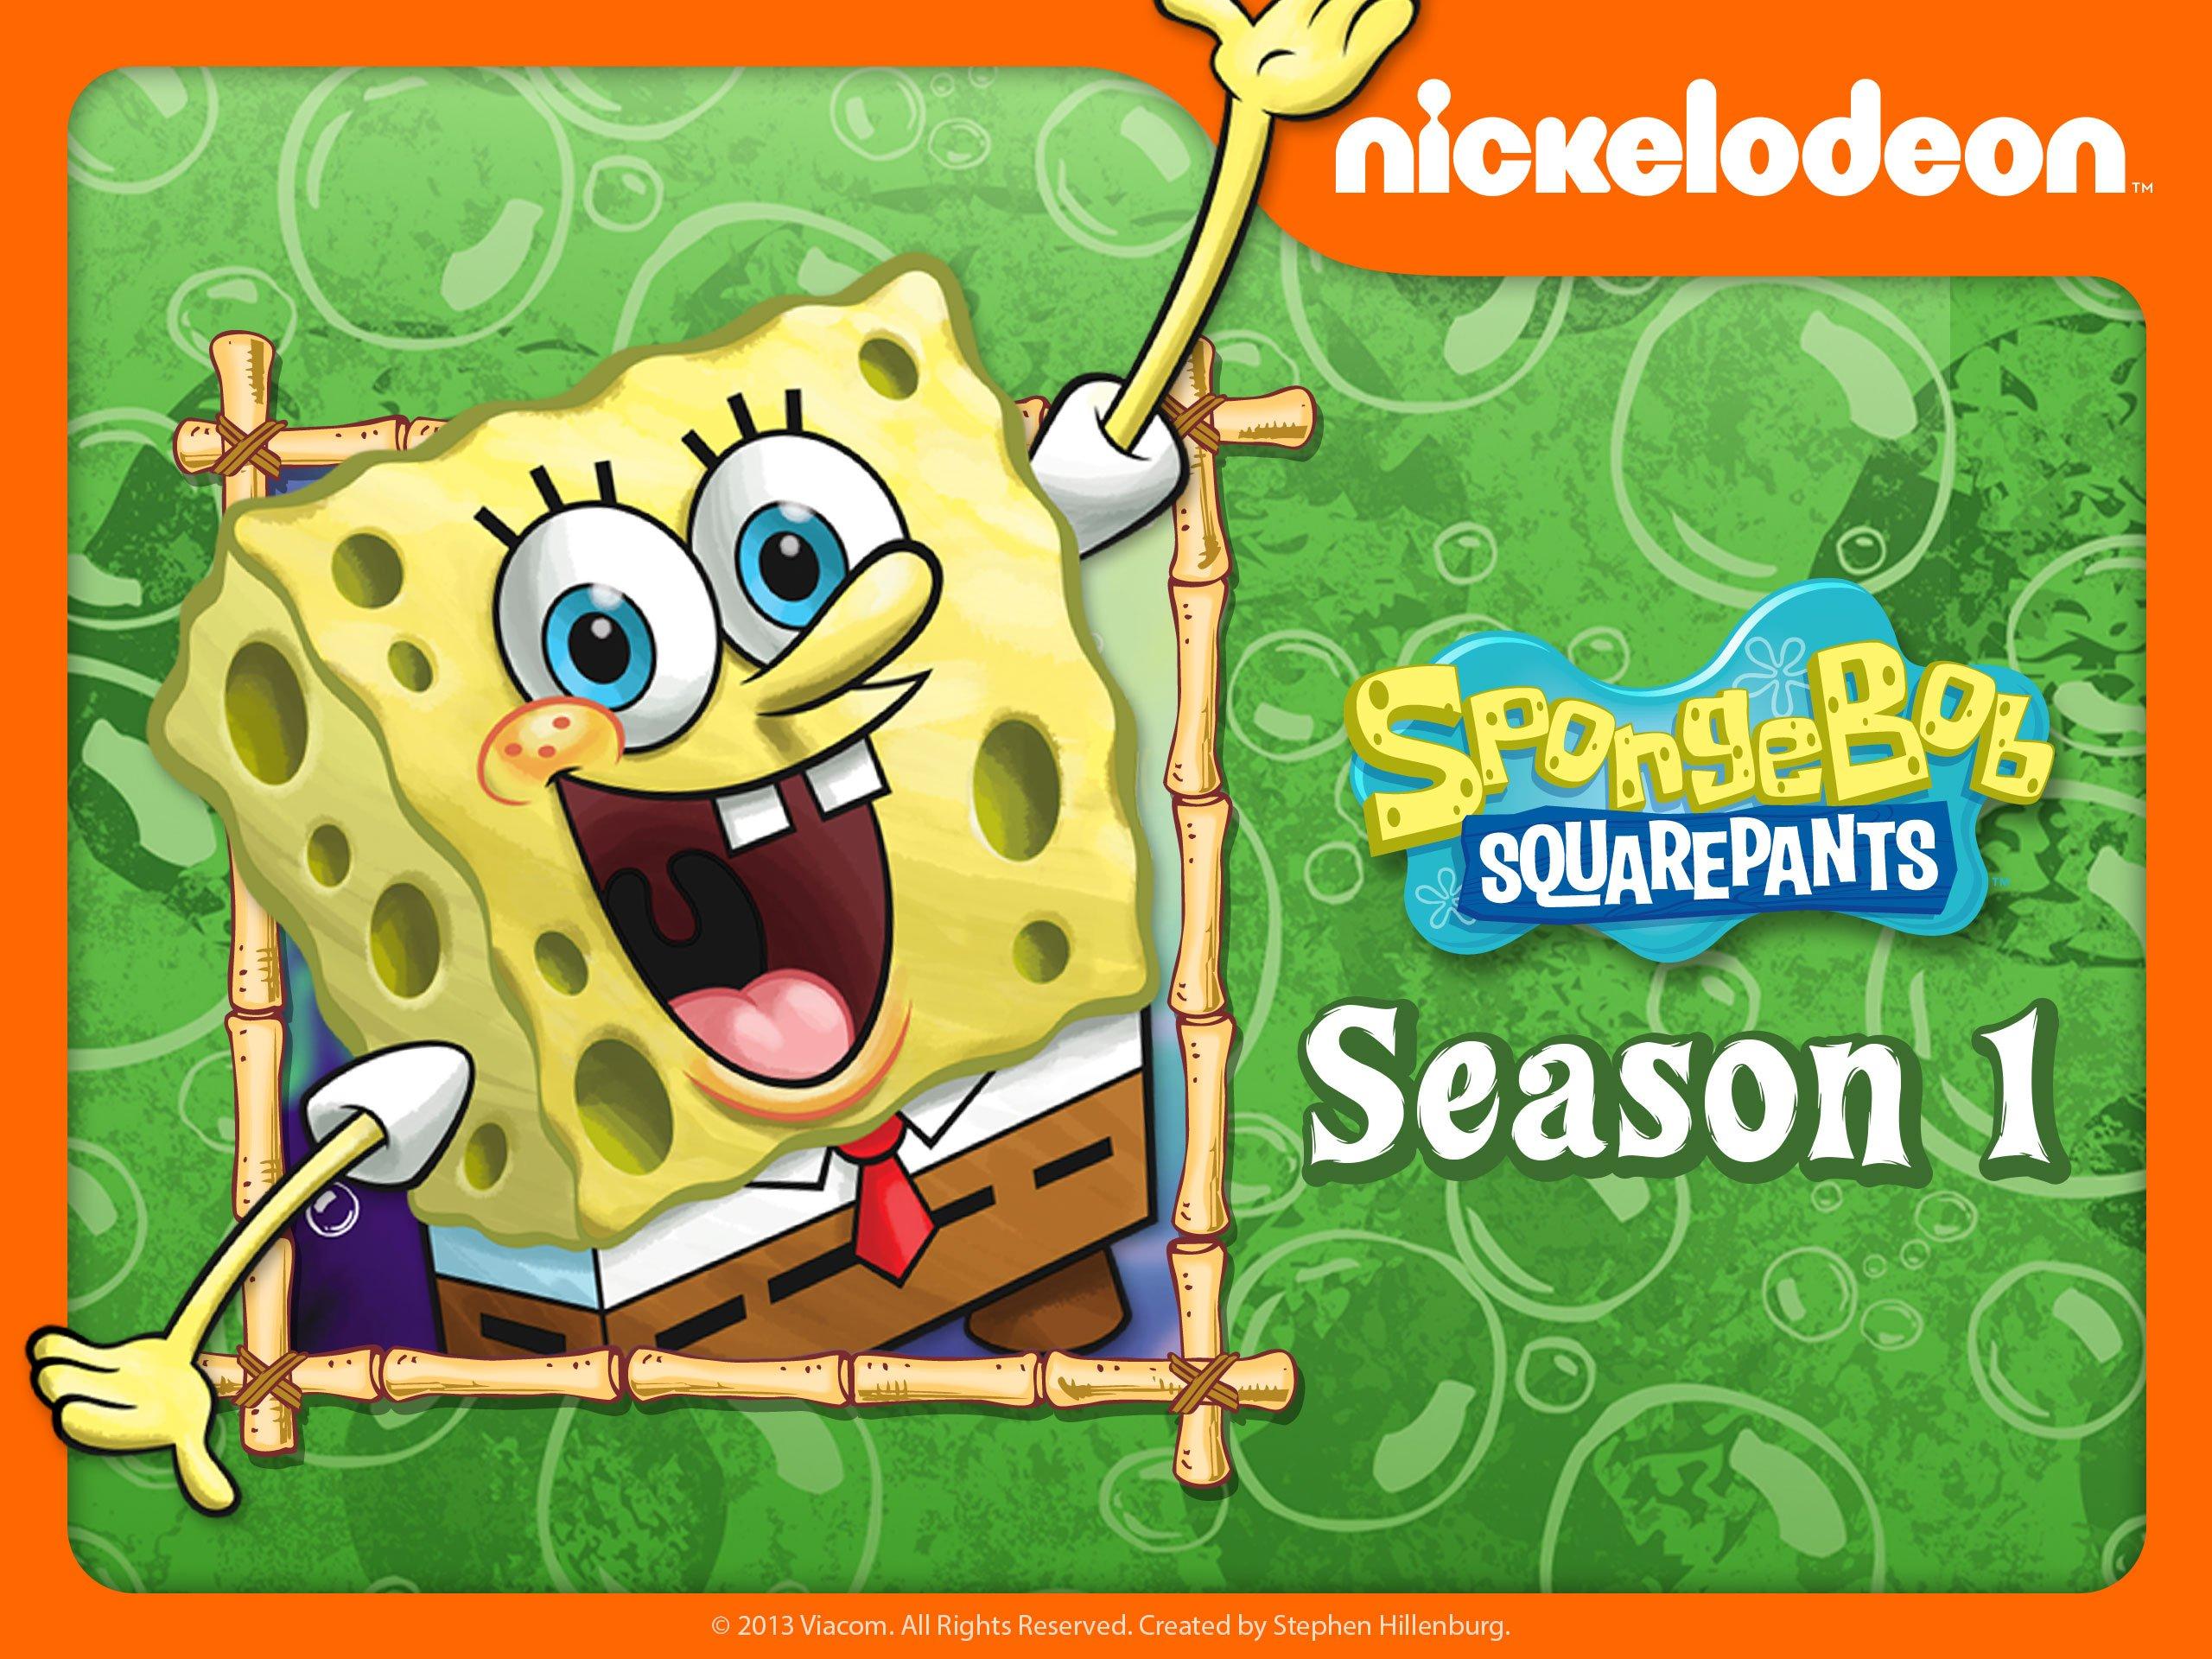 List of spongebob christmas episodes / Mullassery madhavan kutty